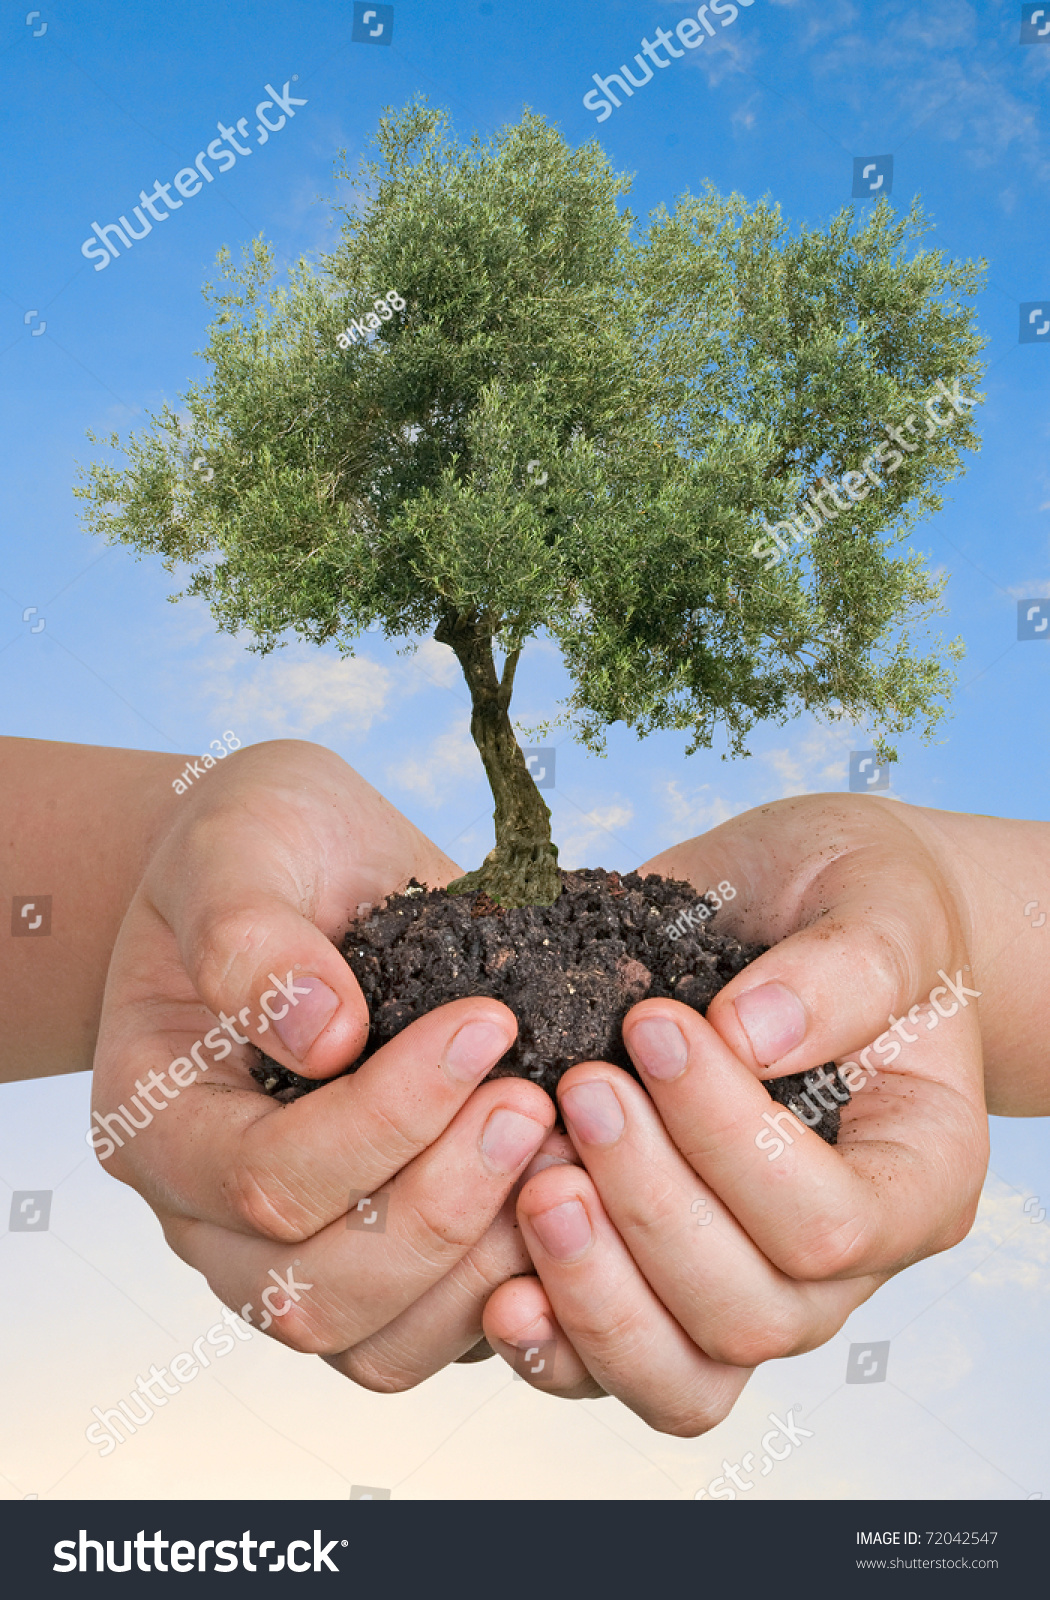 Olive tree hands symbol nature protection stock photo 72042547 olive tree in hands as a symbol of nature protection buycottarizona Choice Image